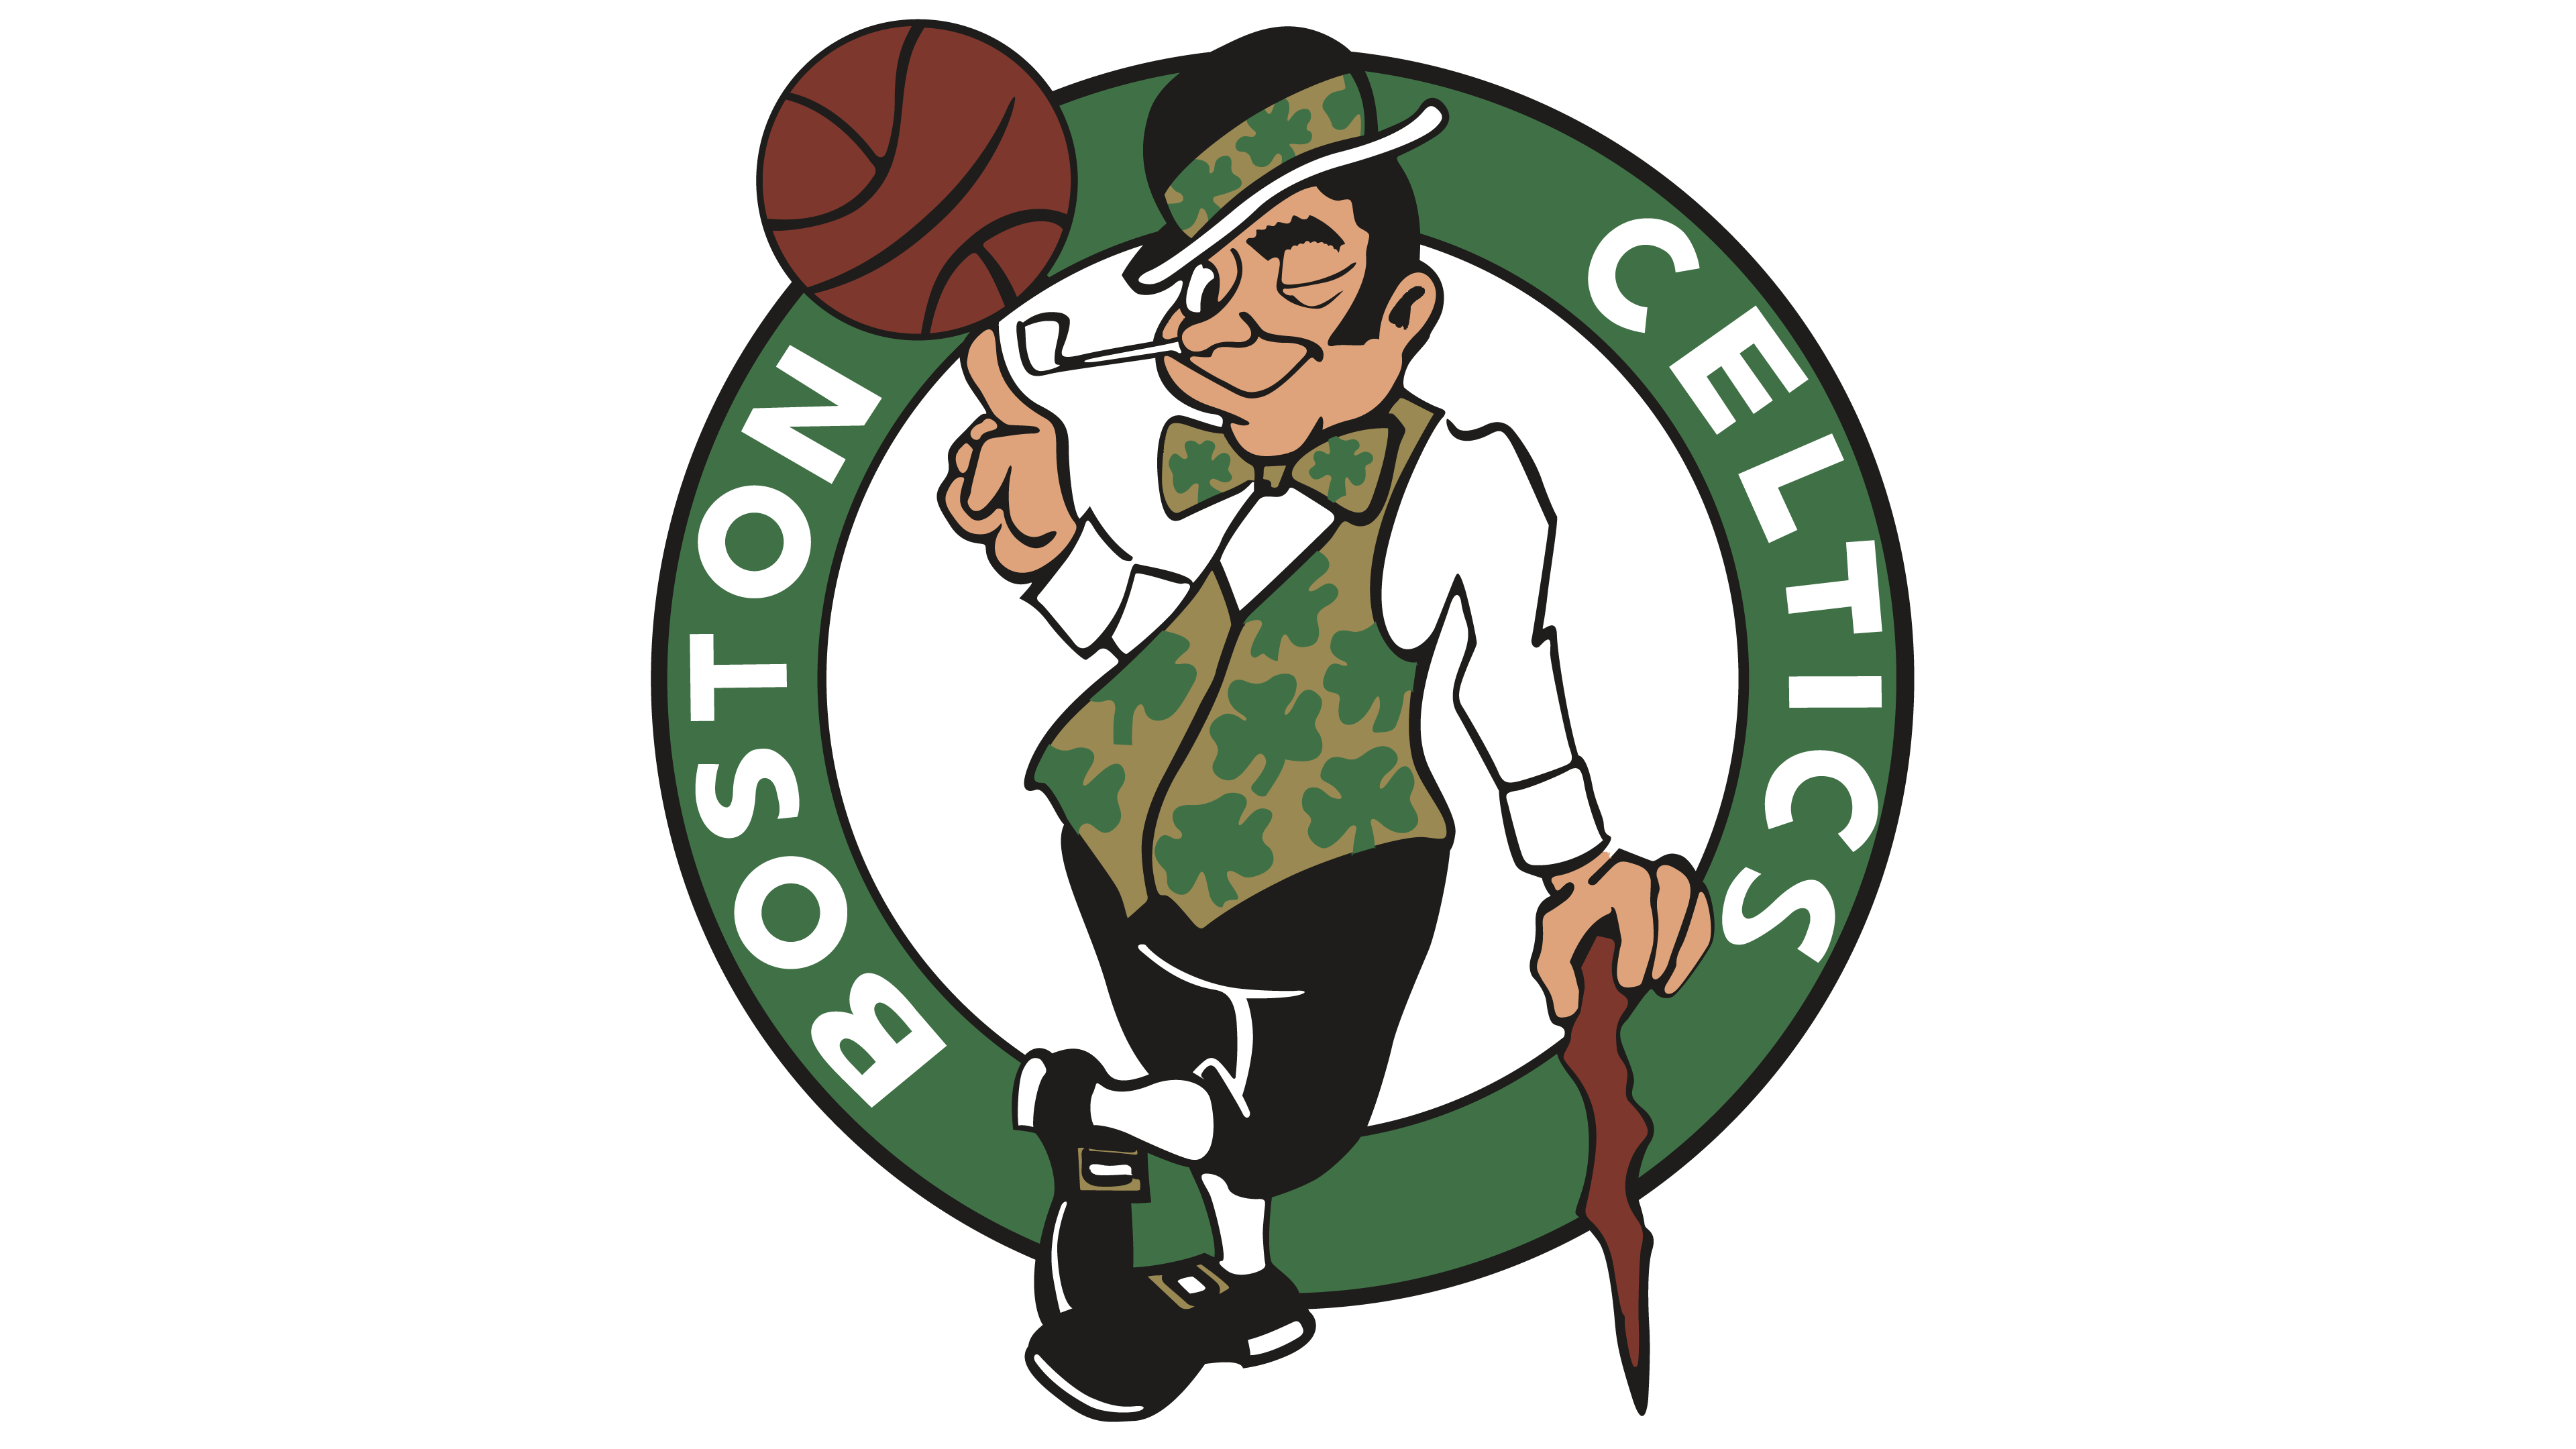 Leprechaun clipart boston celtics. Logo interesting history of